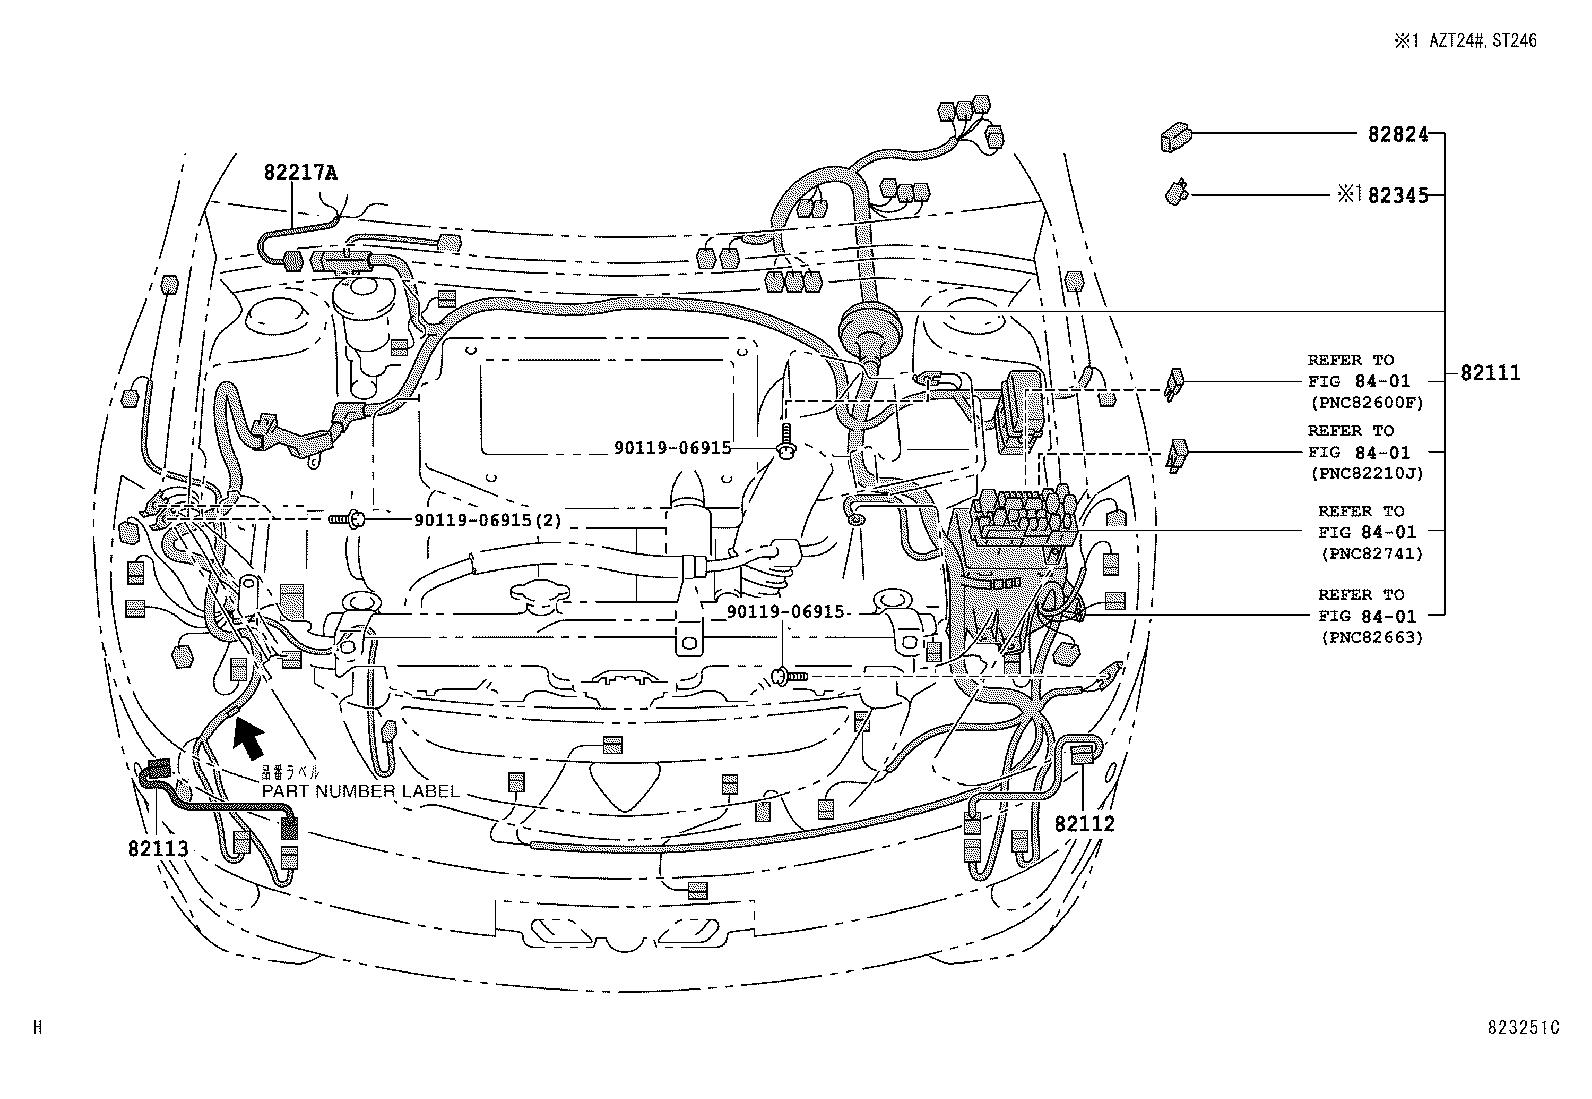 I Need A Wiring Diagram For Toyota Caldina